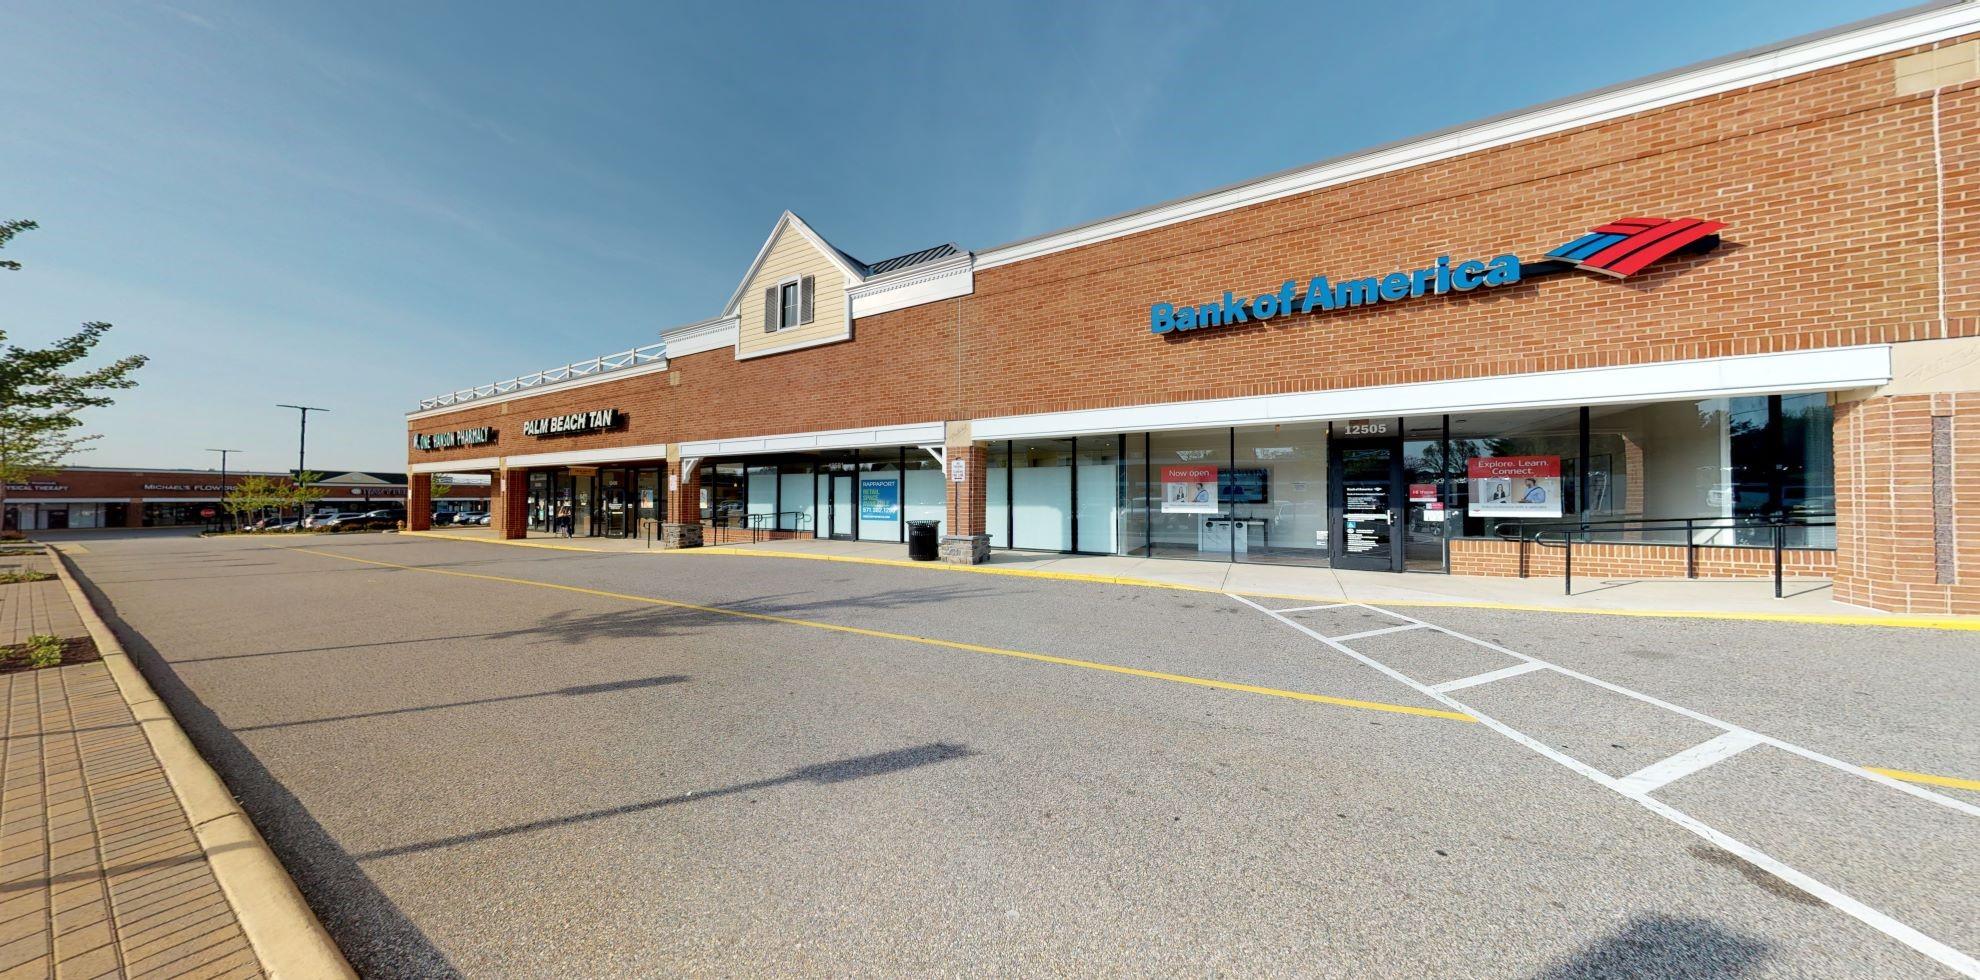 Bank of America Advanced Center with walk-up ATM | 12505 Dillingham Sq, Woodbridge, VA 22192